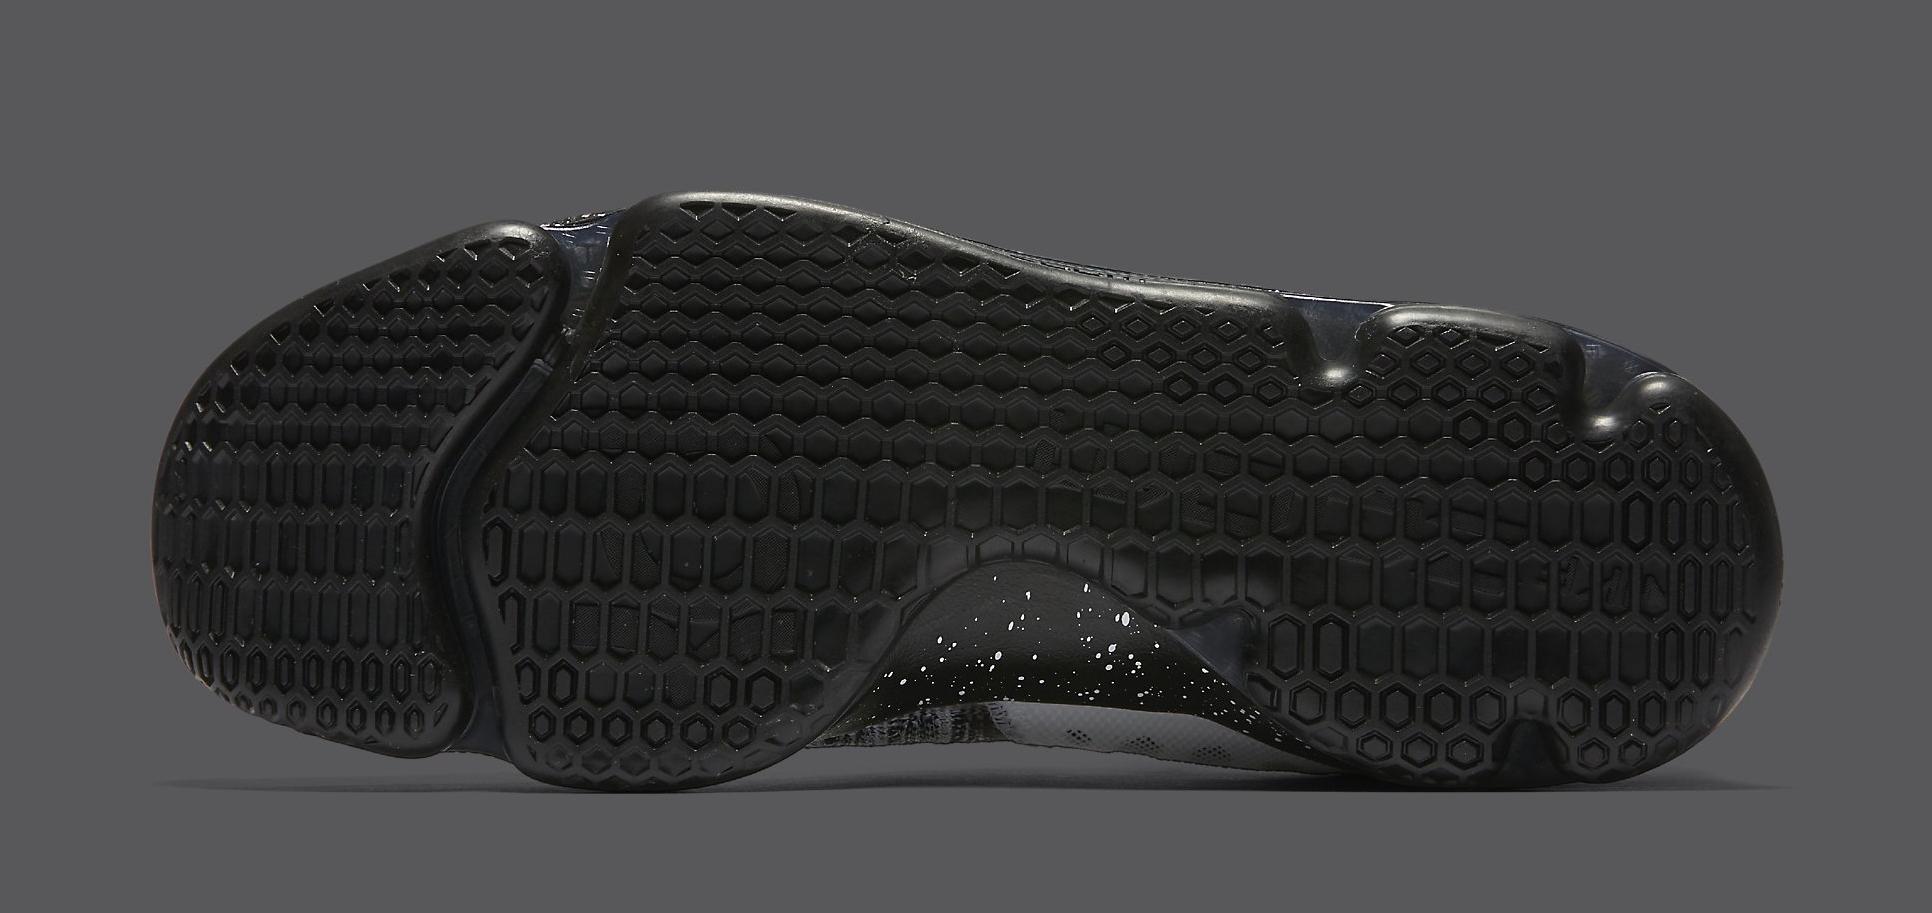 Nike KD 9 White Black Oreo 843392-100 Sole